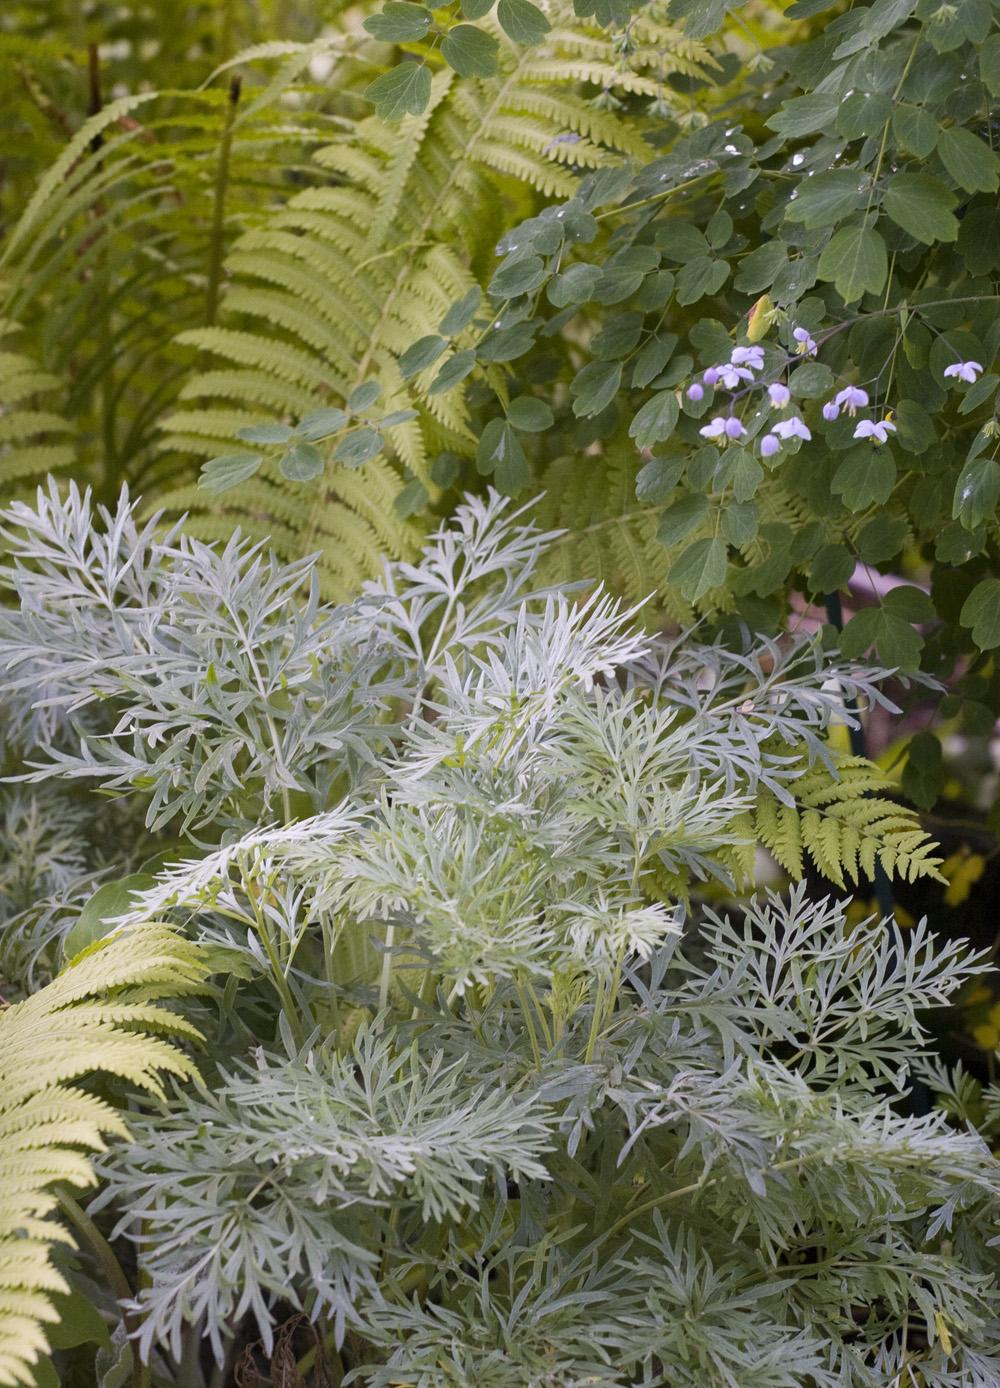 Jeg som er så glad i blonder og kniplinger synes det er fint med de florlette, tynne bladene på malurten. Bildet viser   Artemisia absinthium   ,  men det er mange i samme slekt jeg også liker godt som for eksempel den gode, gamle abrodden.